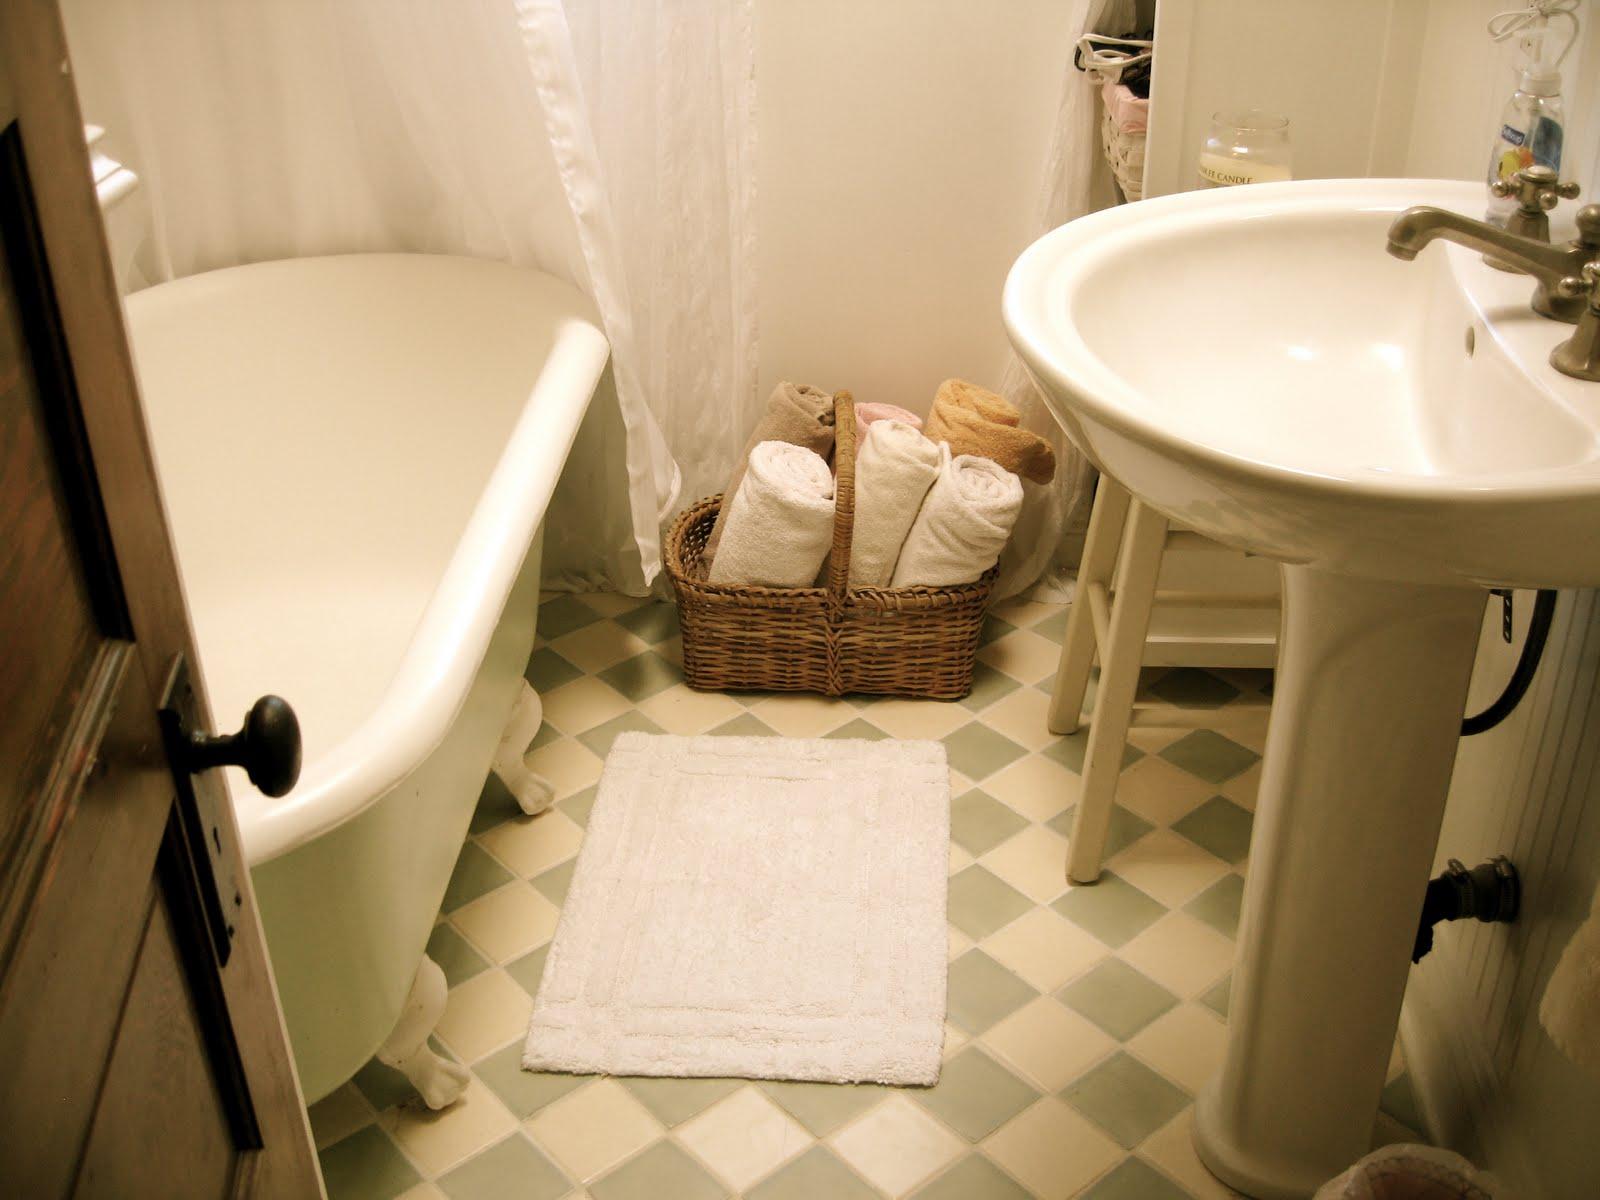 Antique bathroom sink